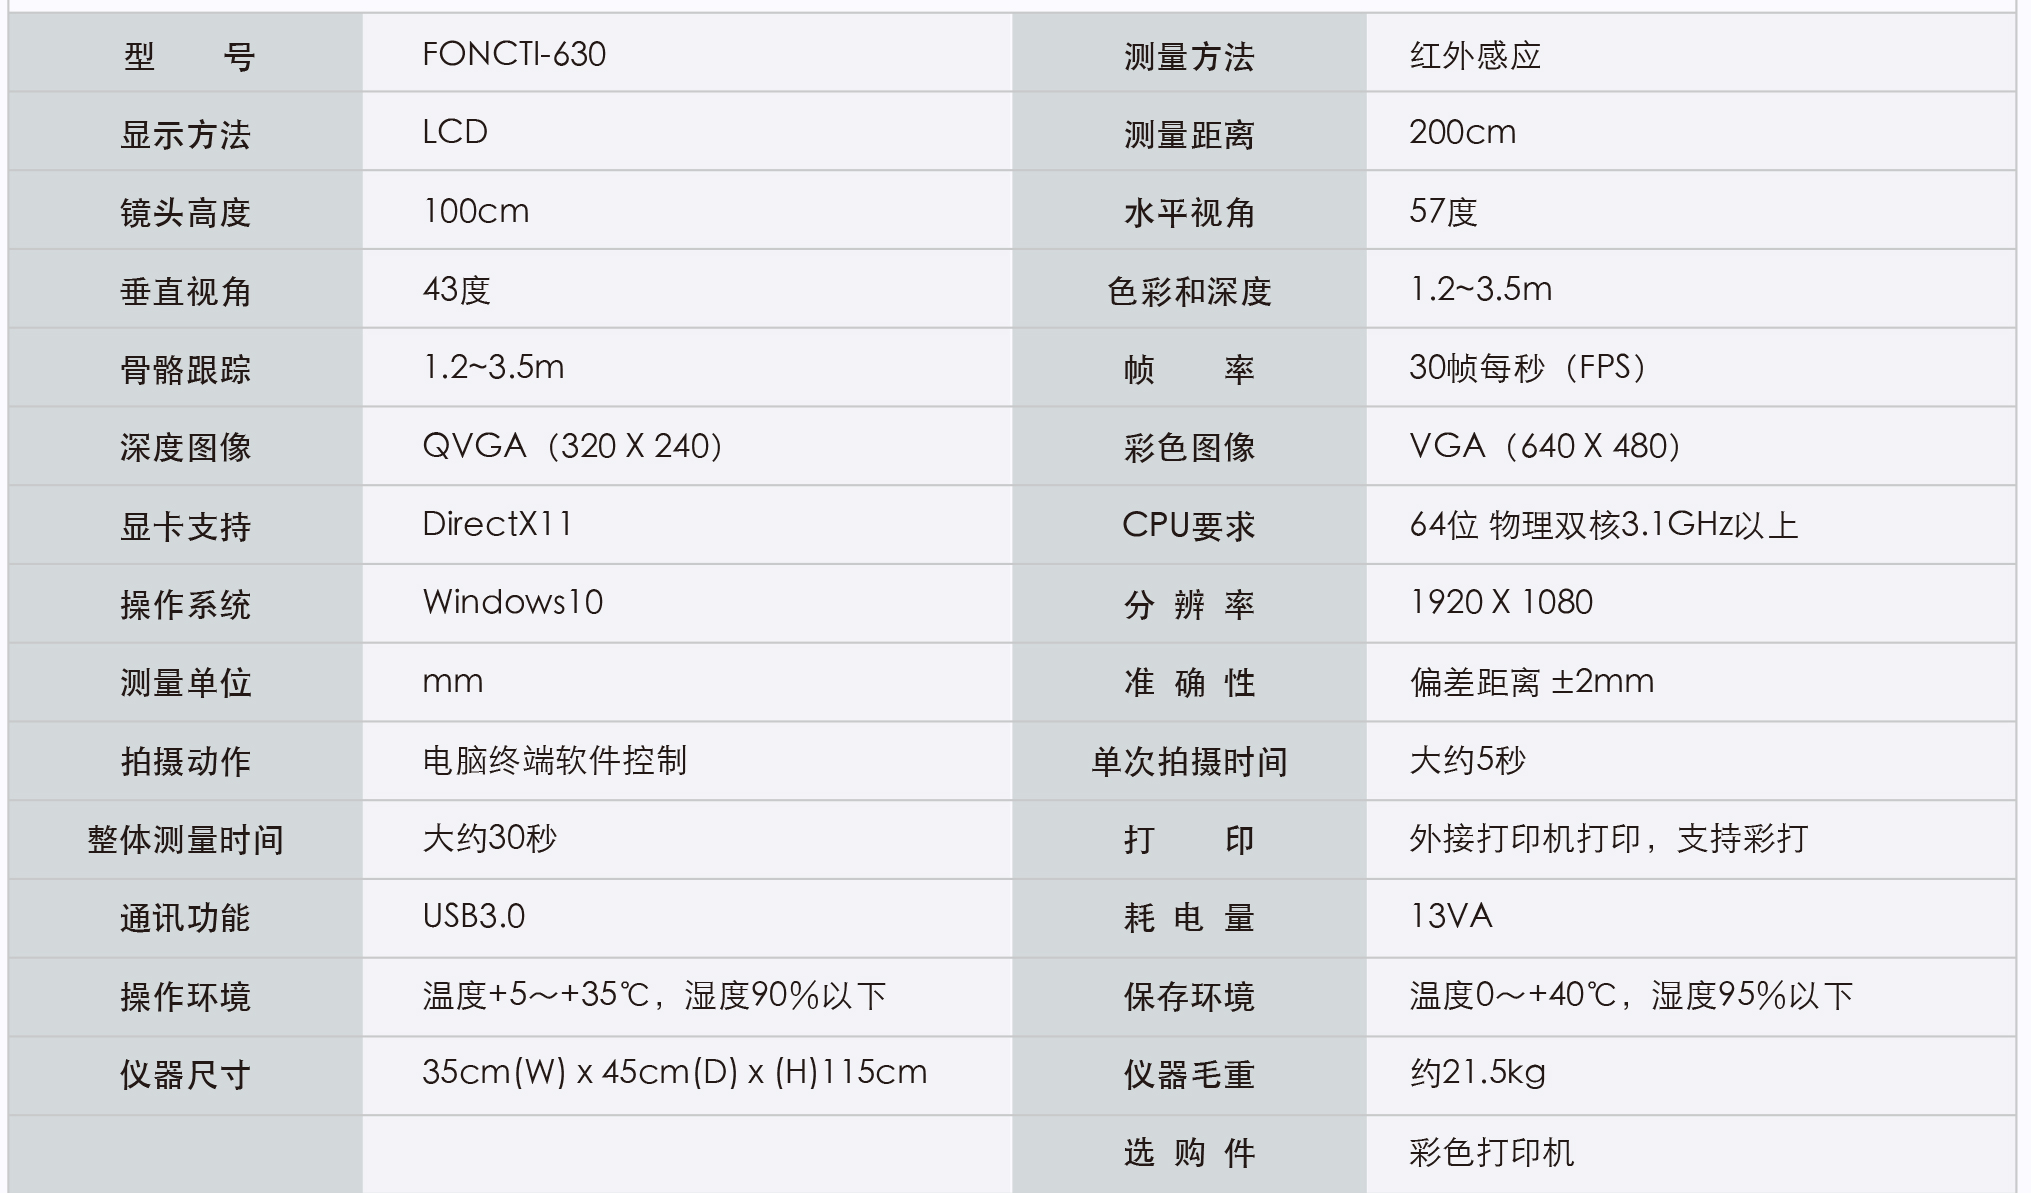 FONCTI-630姿态评估系统参数